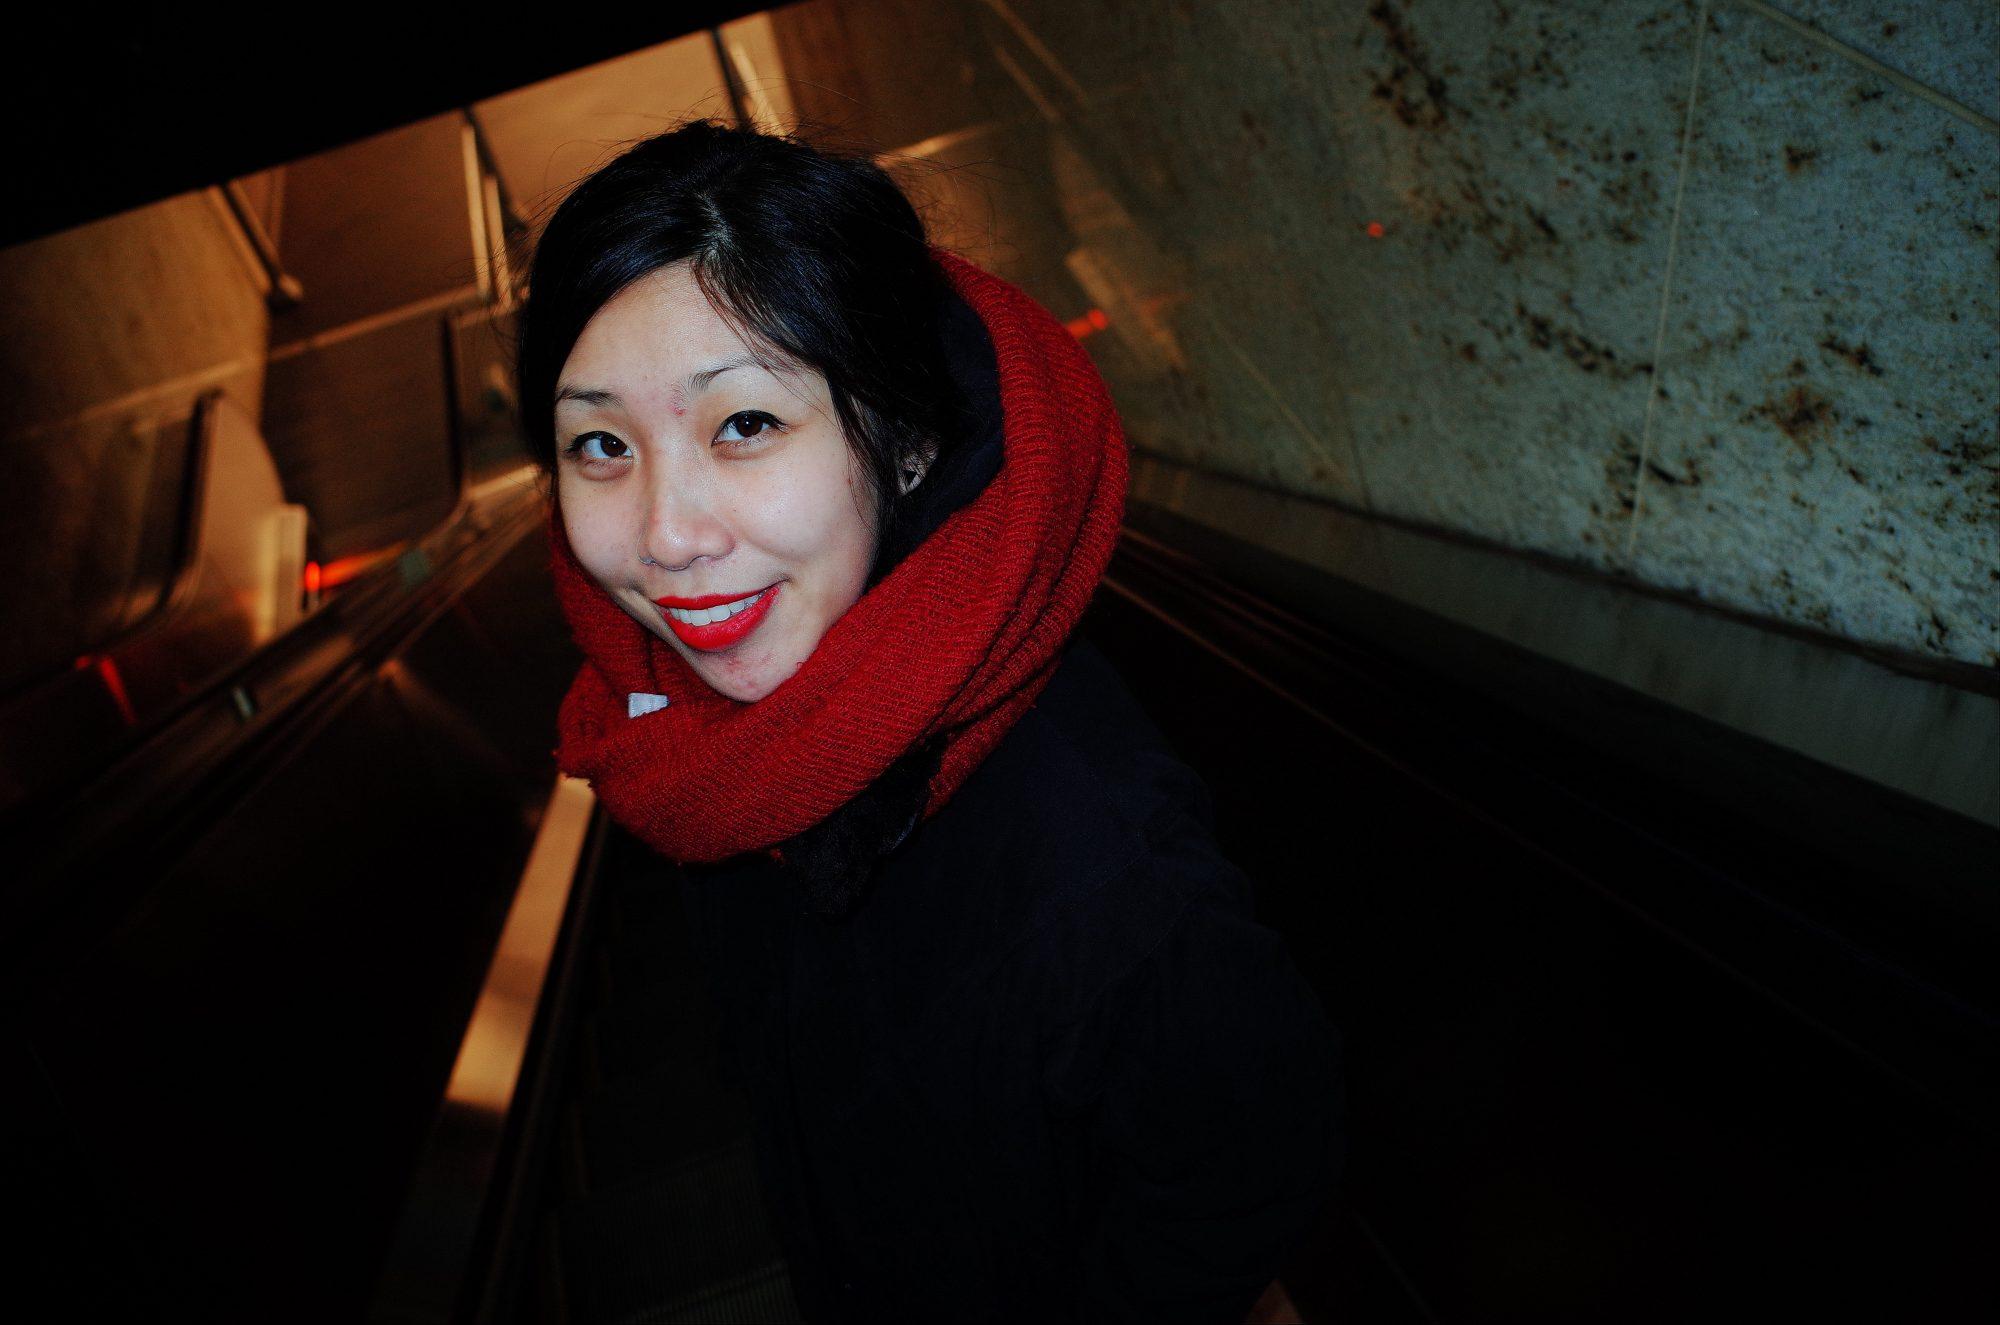 Cindy going down escalator. NYC, 2018